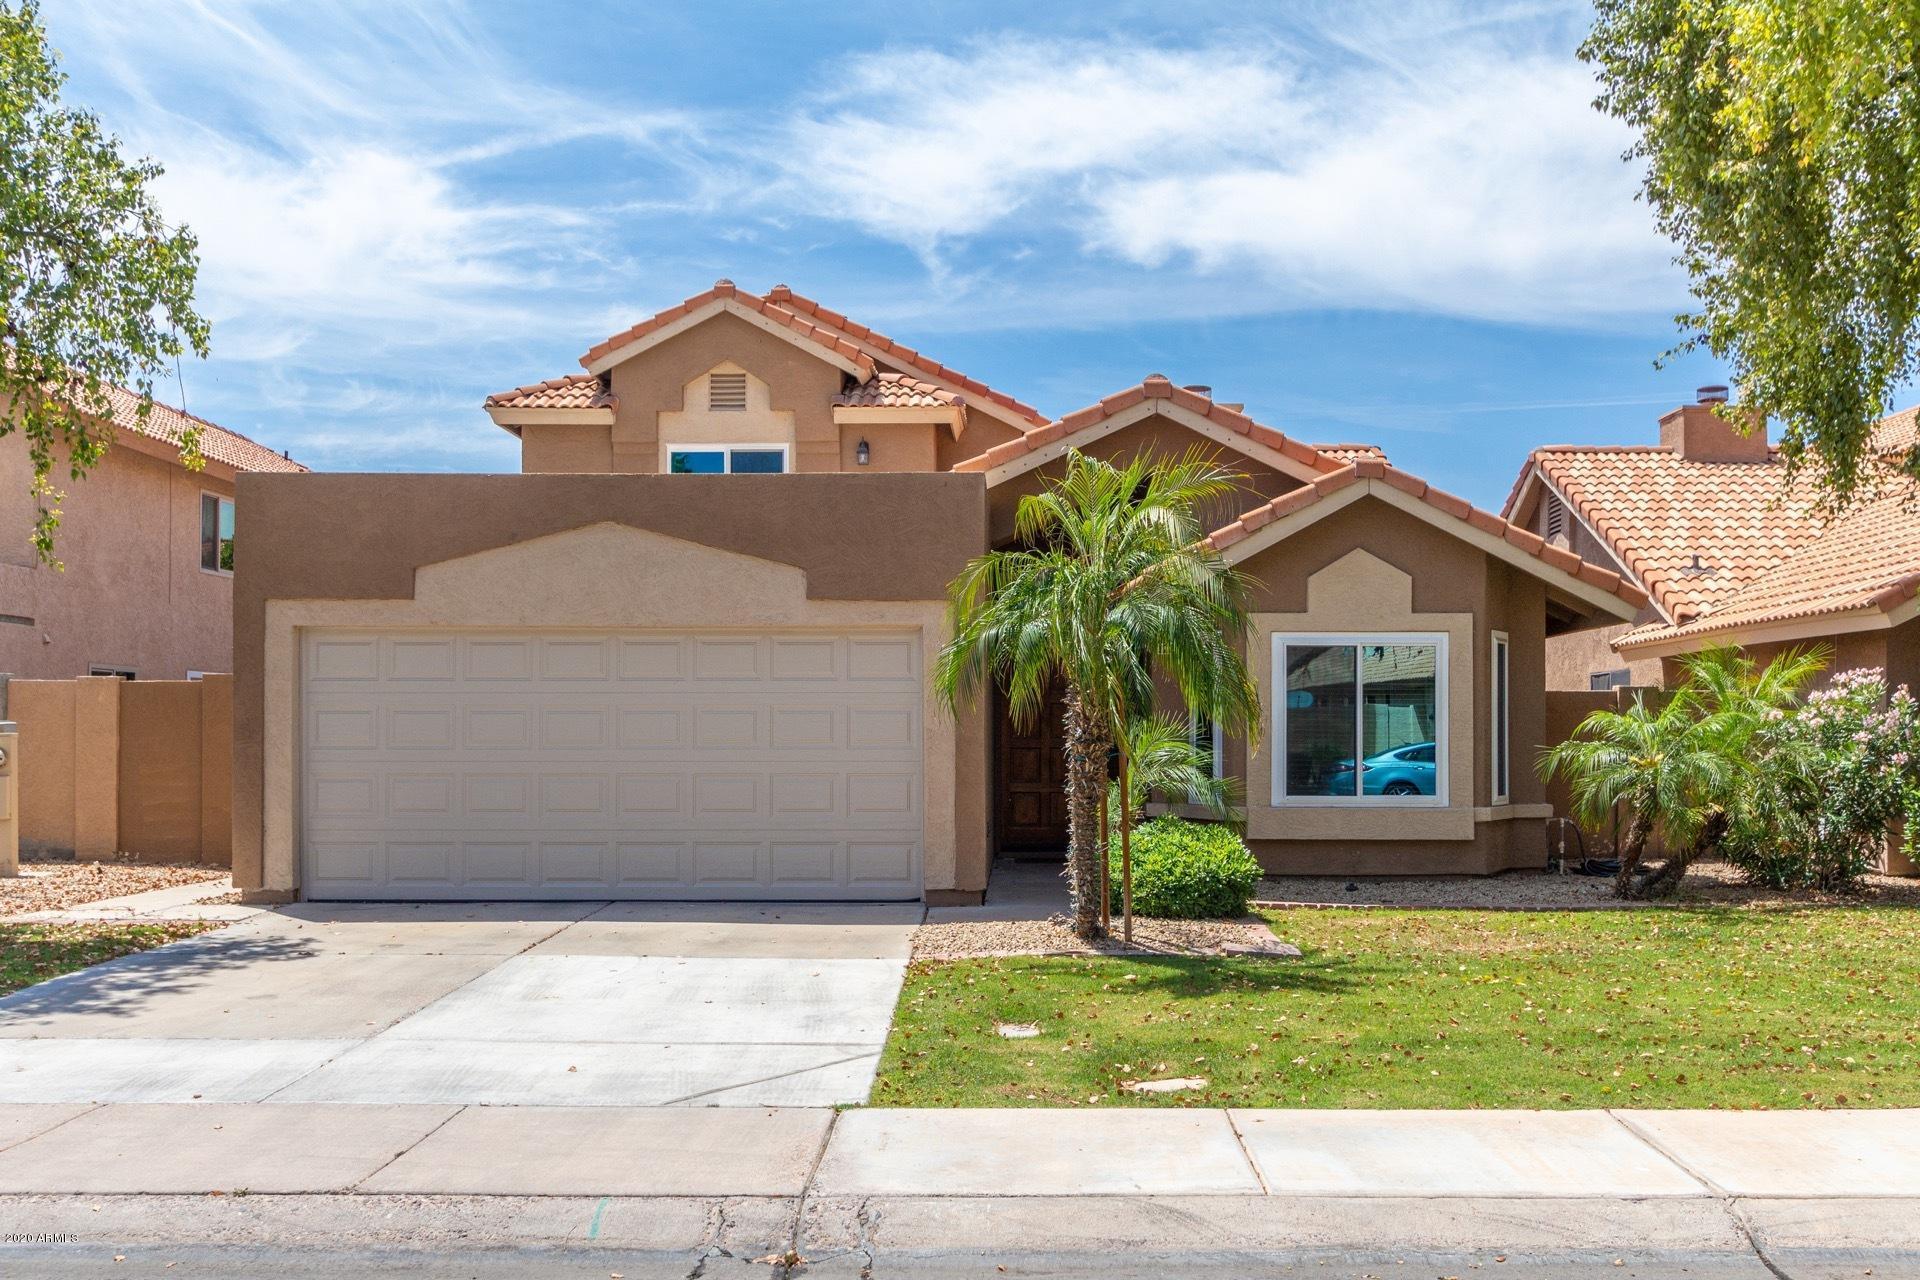 Photo of 1219 W SAND DUNE Drive, Gilbert, AZ 85233